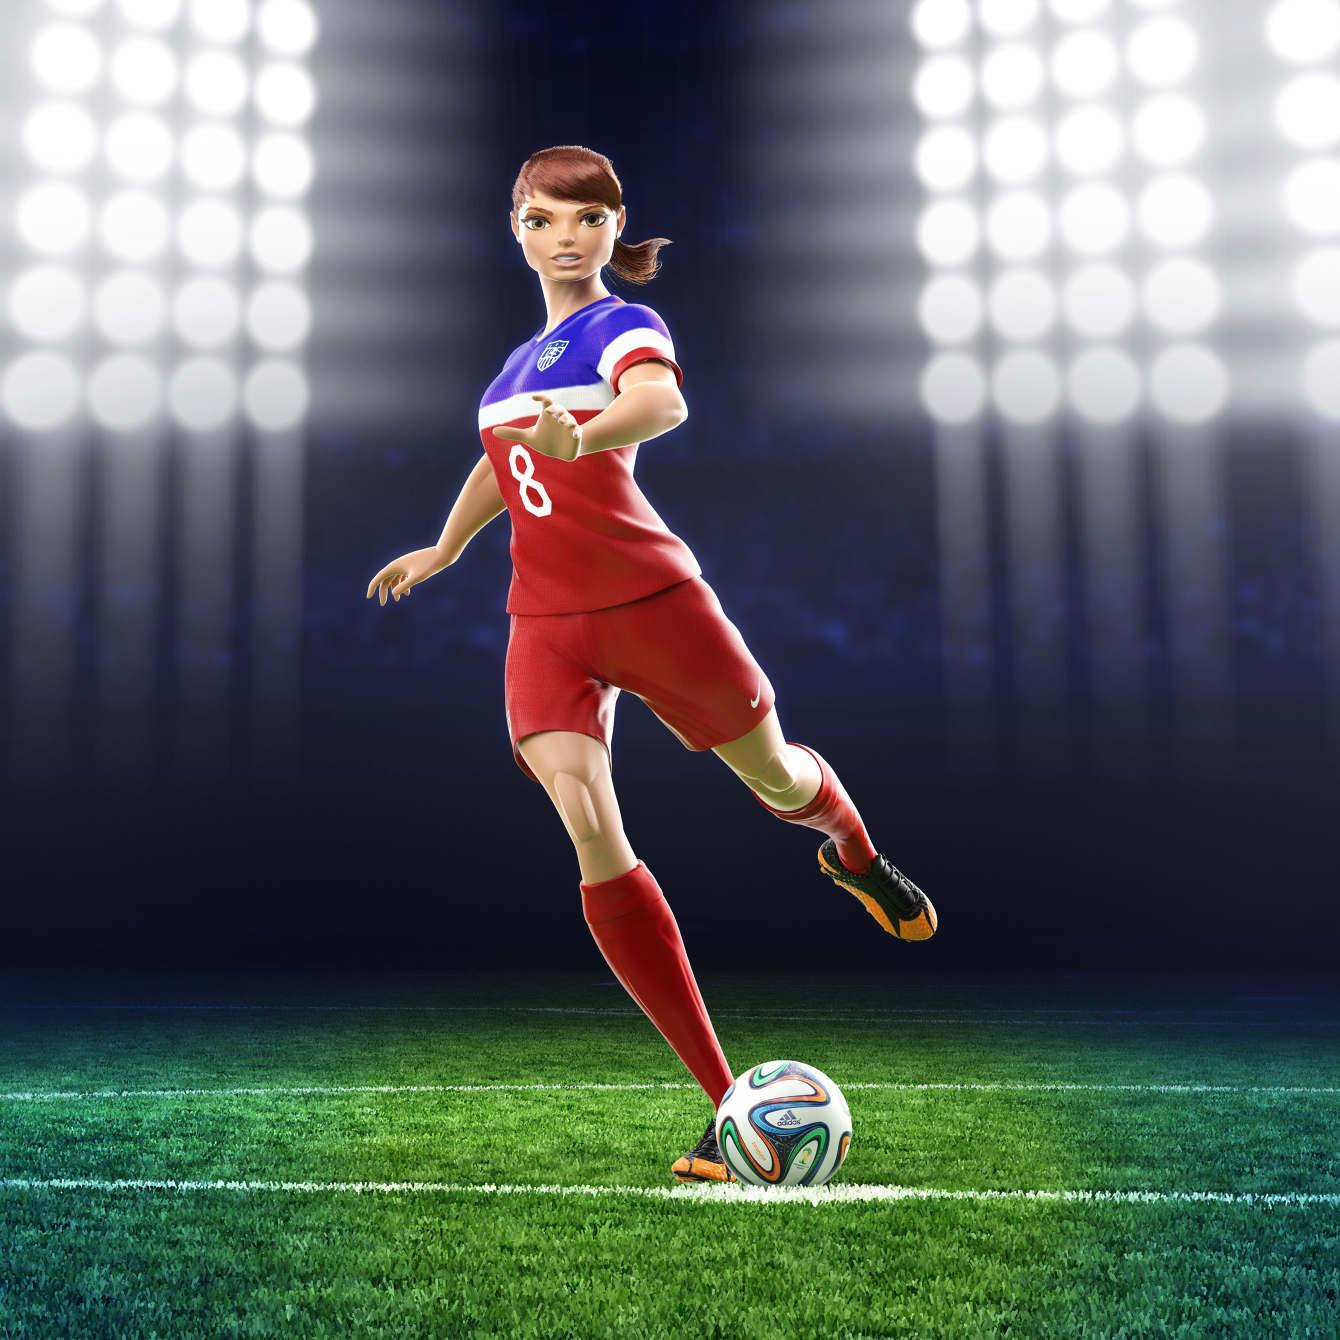 sports-character-design-soccer_W_1340_c.jpg